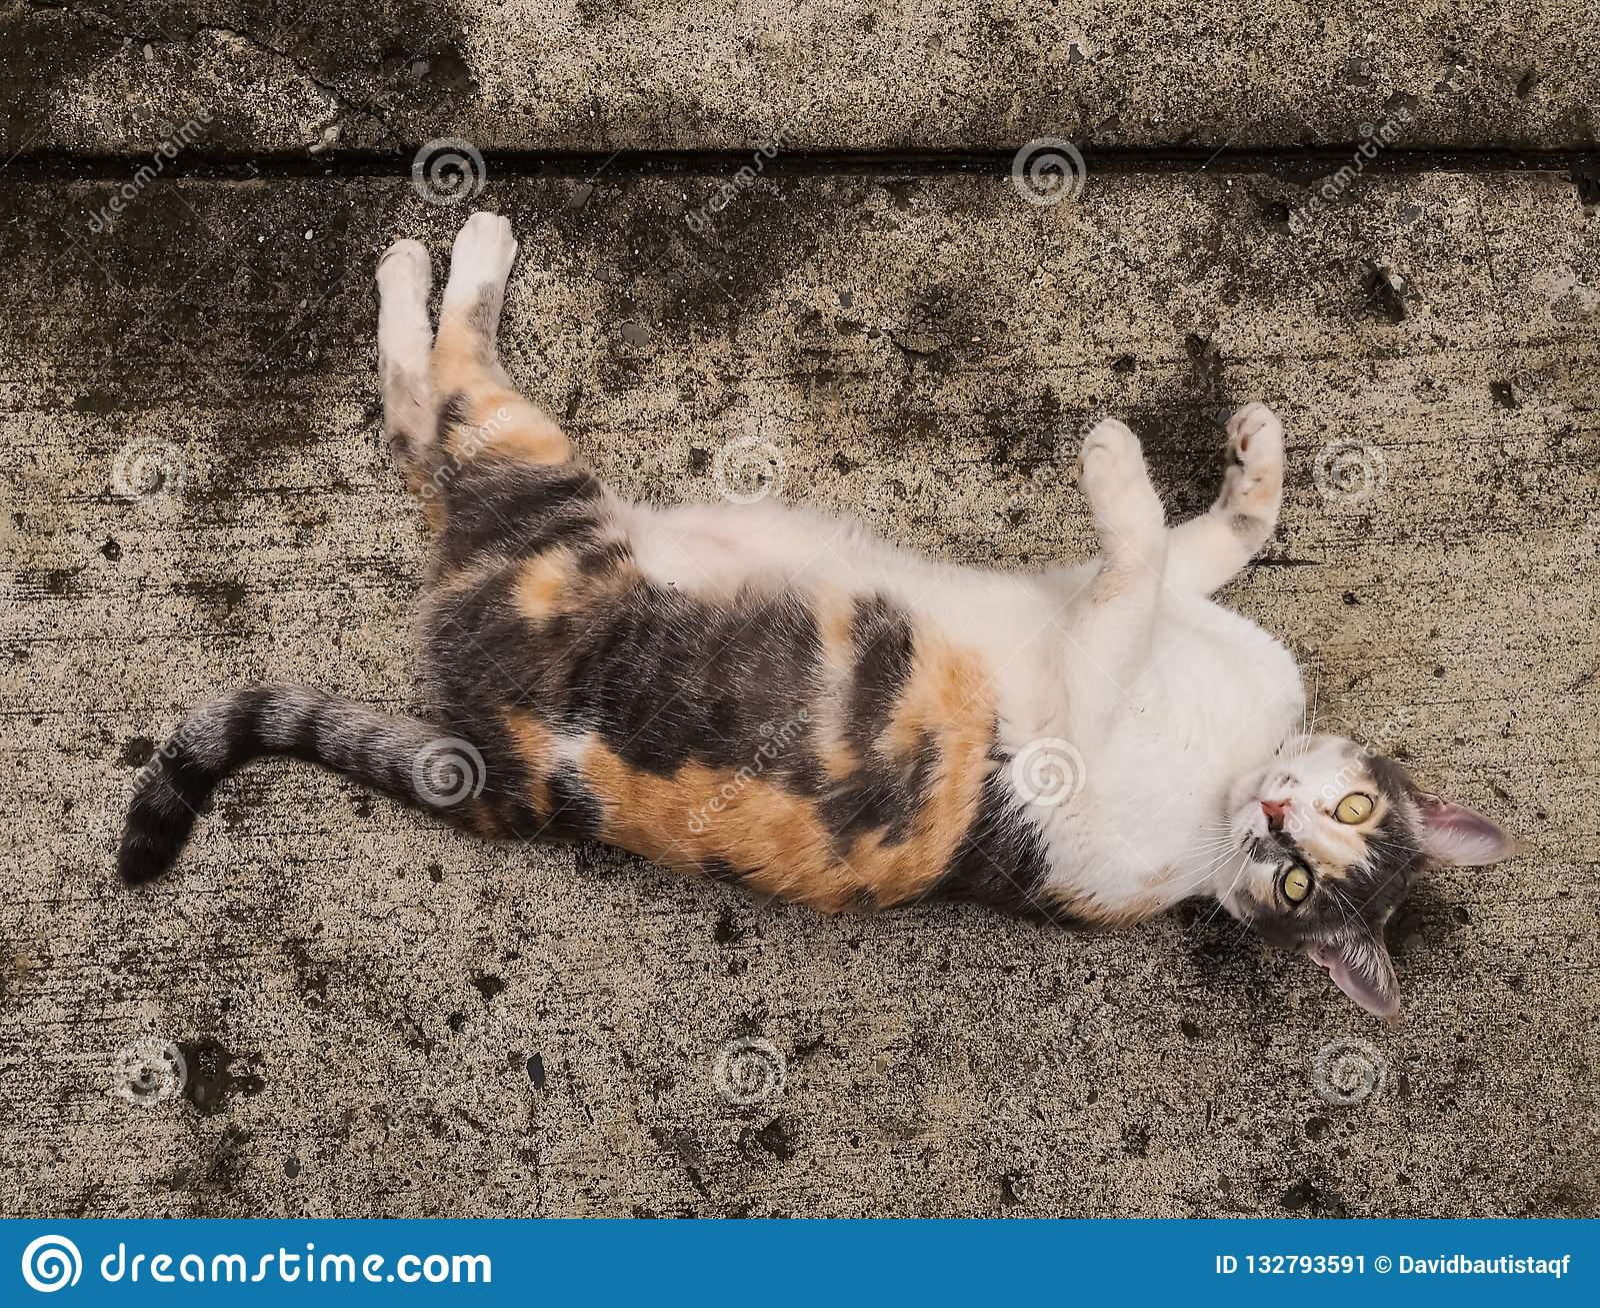 White, orange and gray cat pet over concrete floor